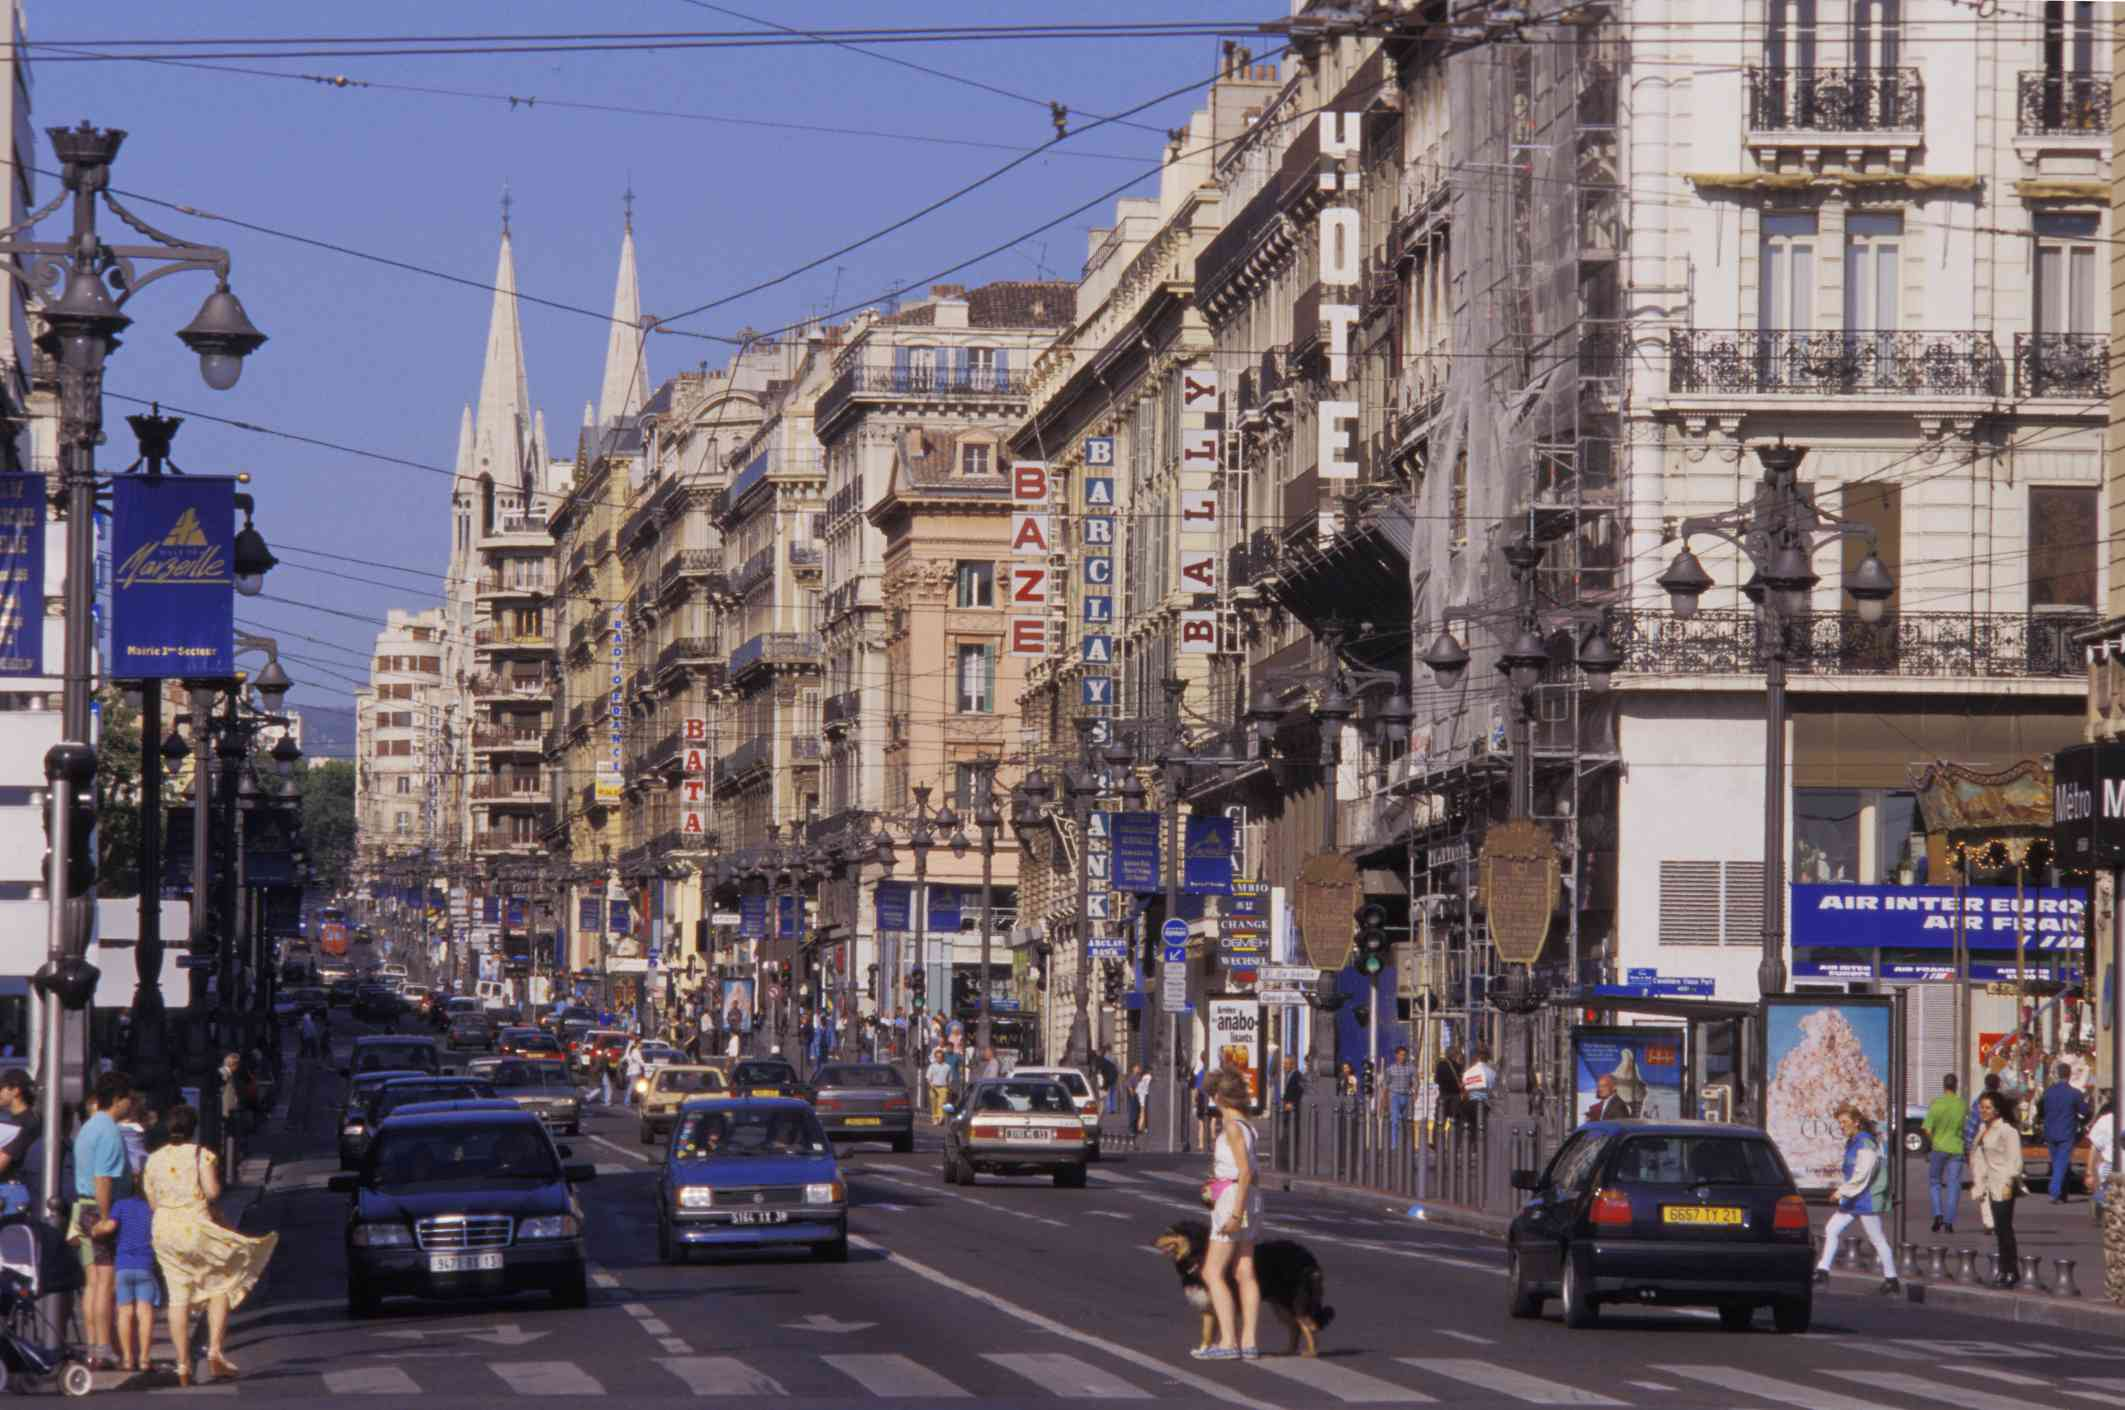 Canebière Avenue in Marseille, France